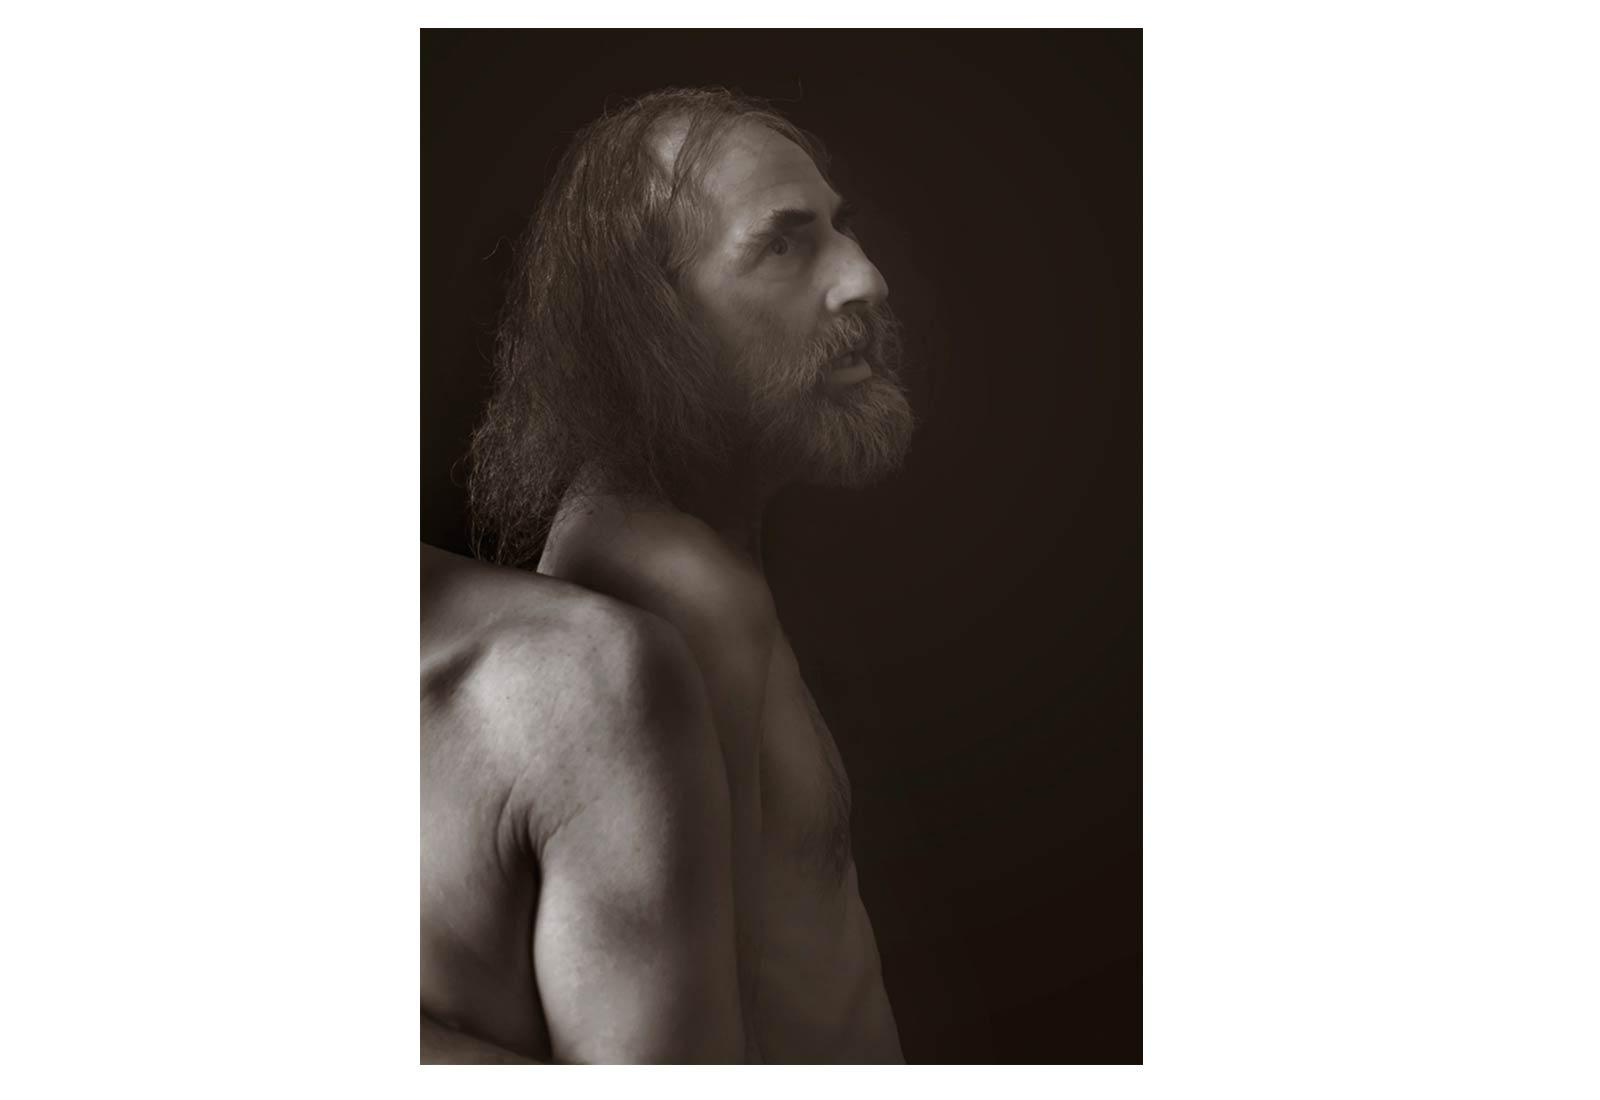 Peter Moseley - Tim